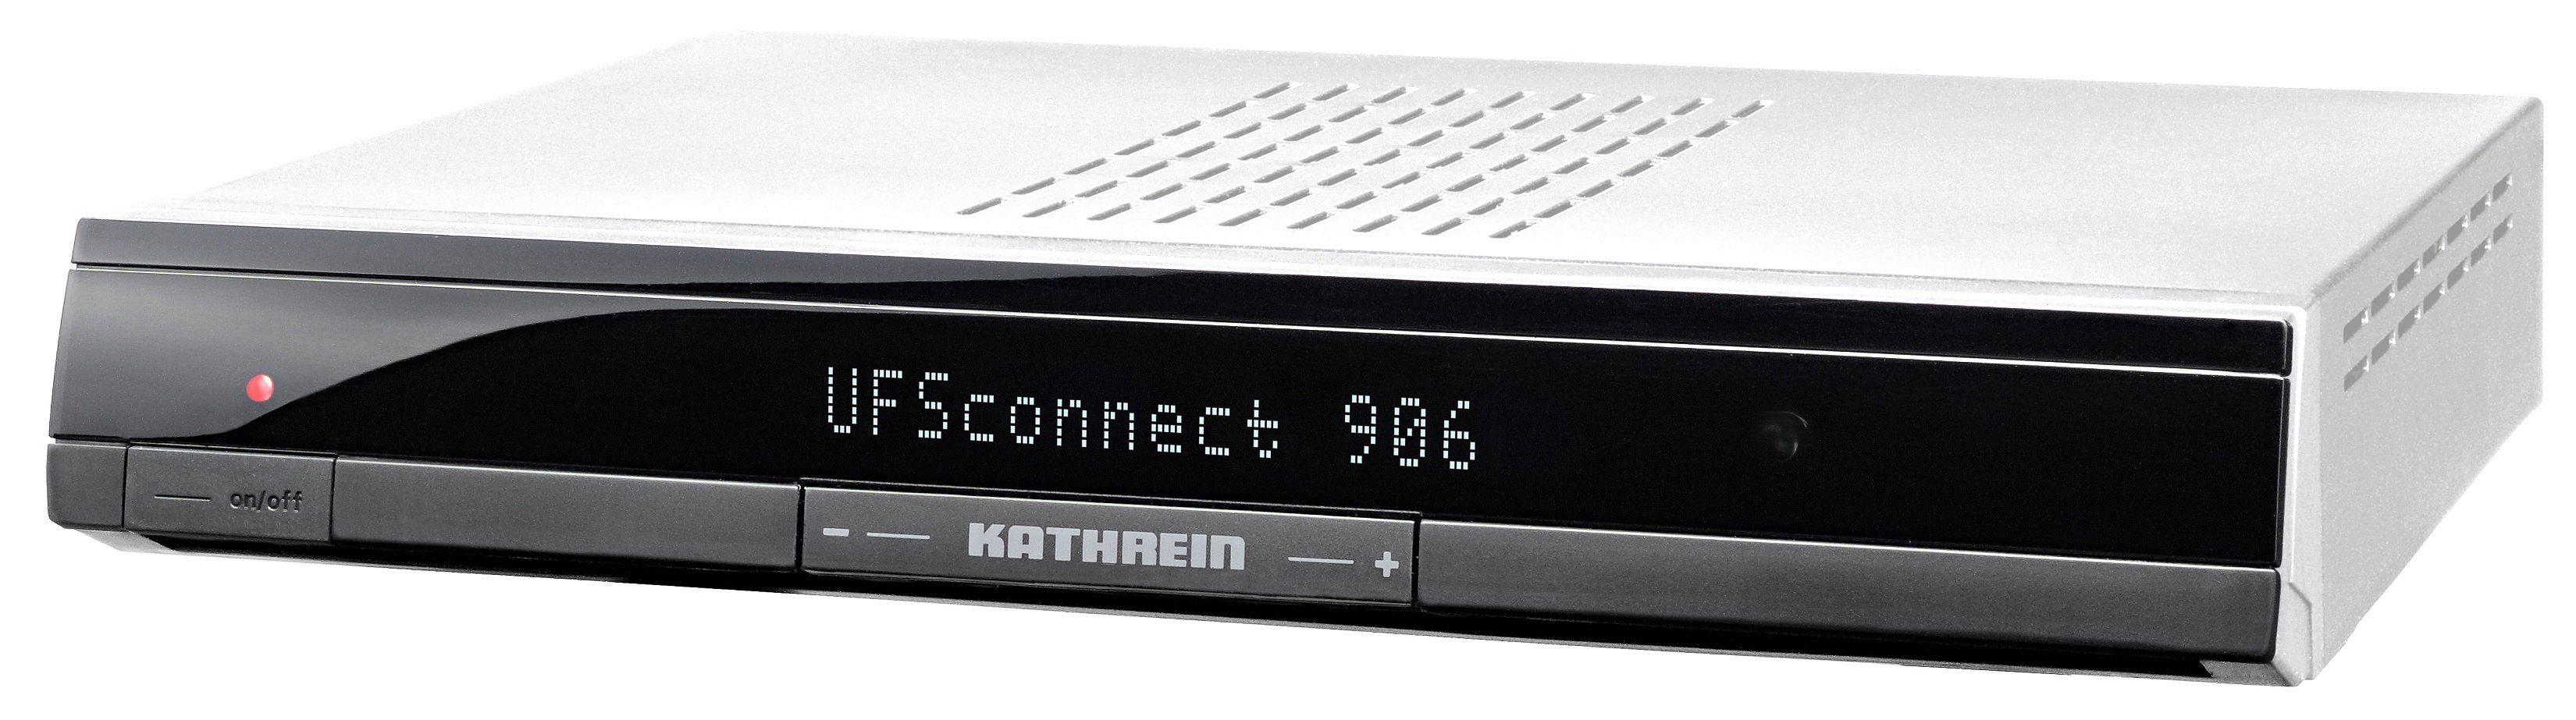 Kathrein Smart-TV-Receiver HDTV »UFSconnect 906si«